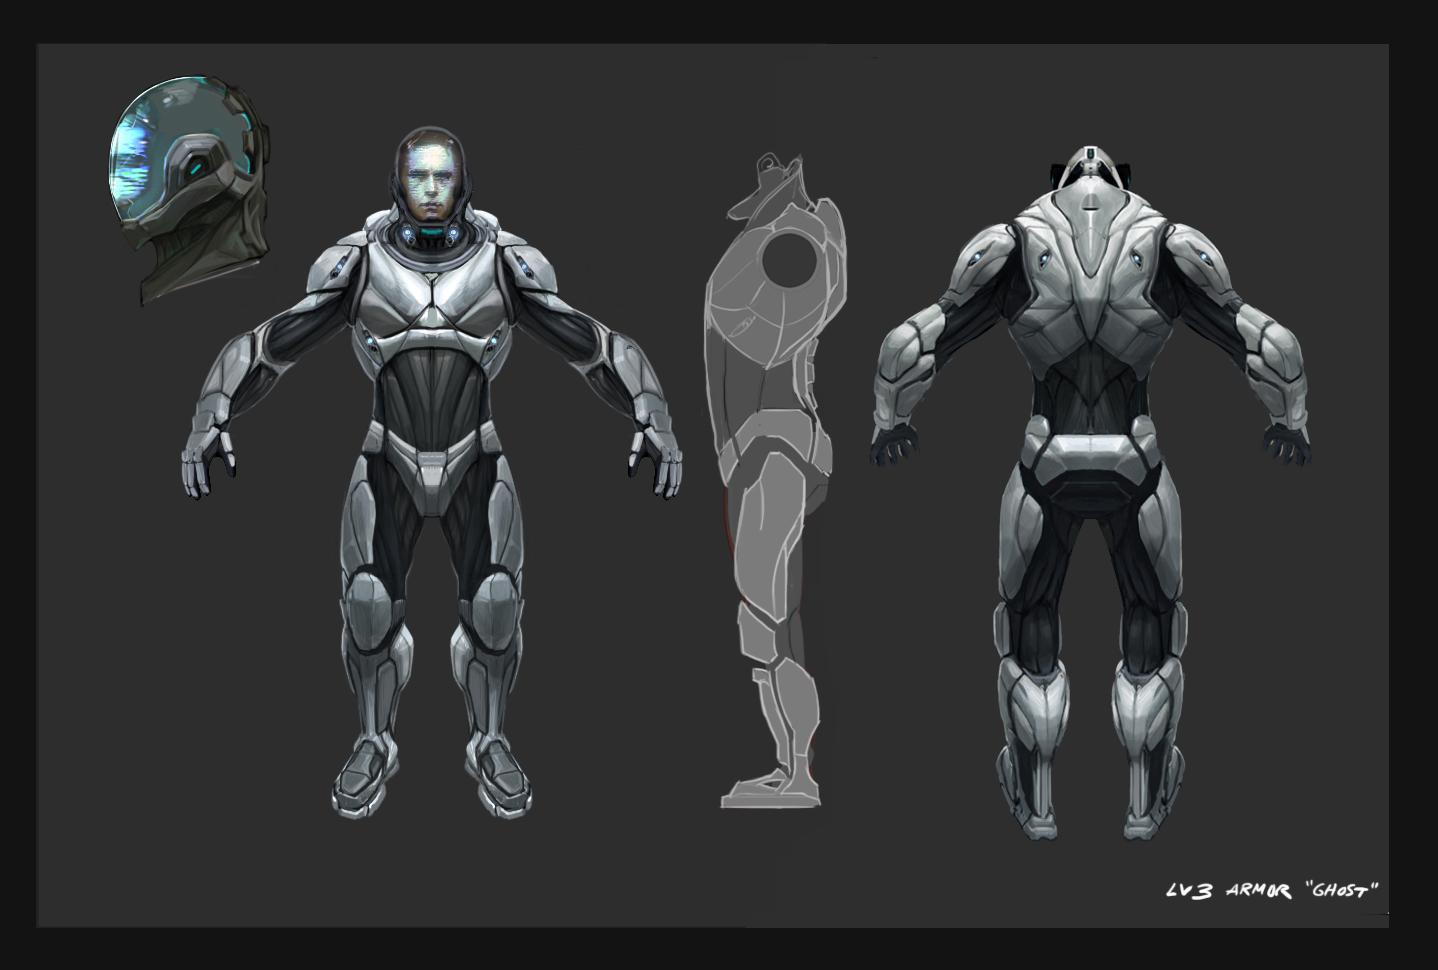 ghost armor armor xcom wiki fandom powered by wikia. Black Bedroom Furniture Sets. Home Design Ideas